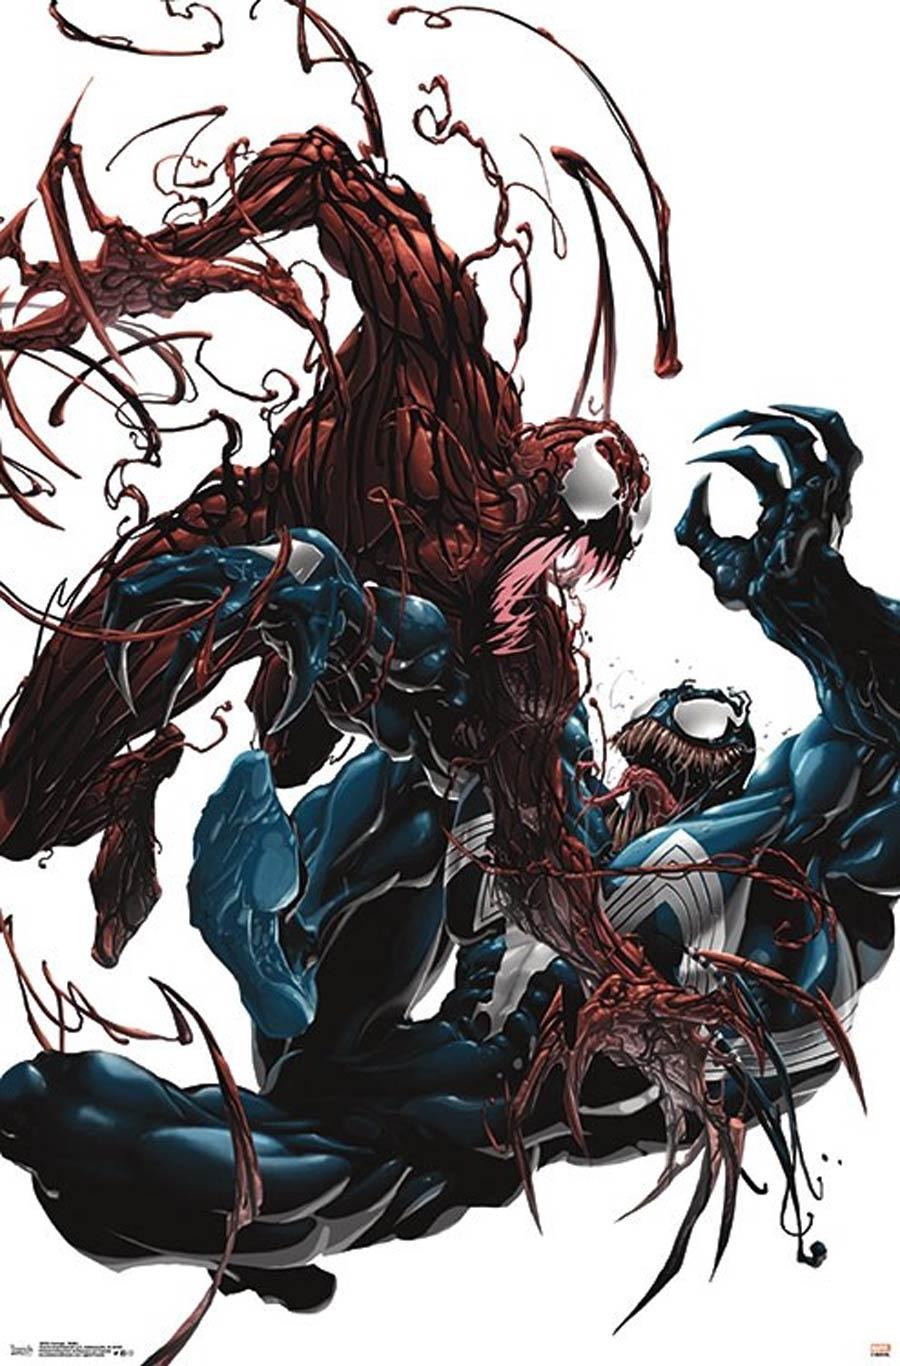 Marvel Comics Carnage Battle Wall Poster